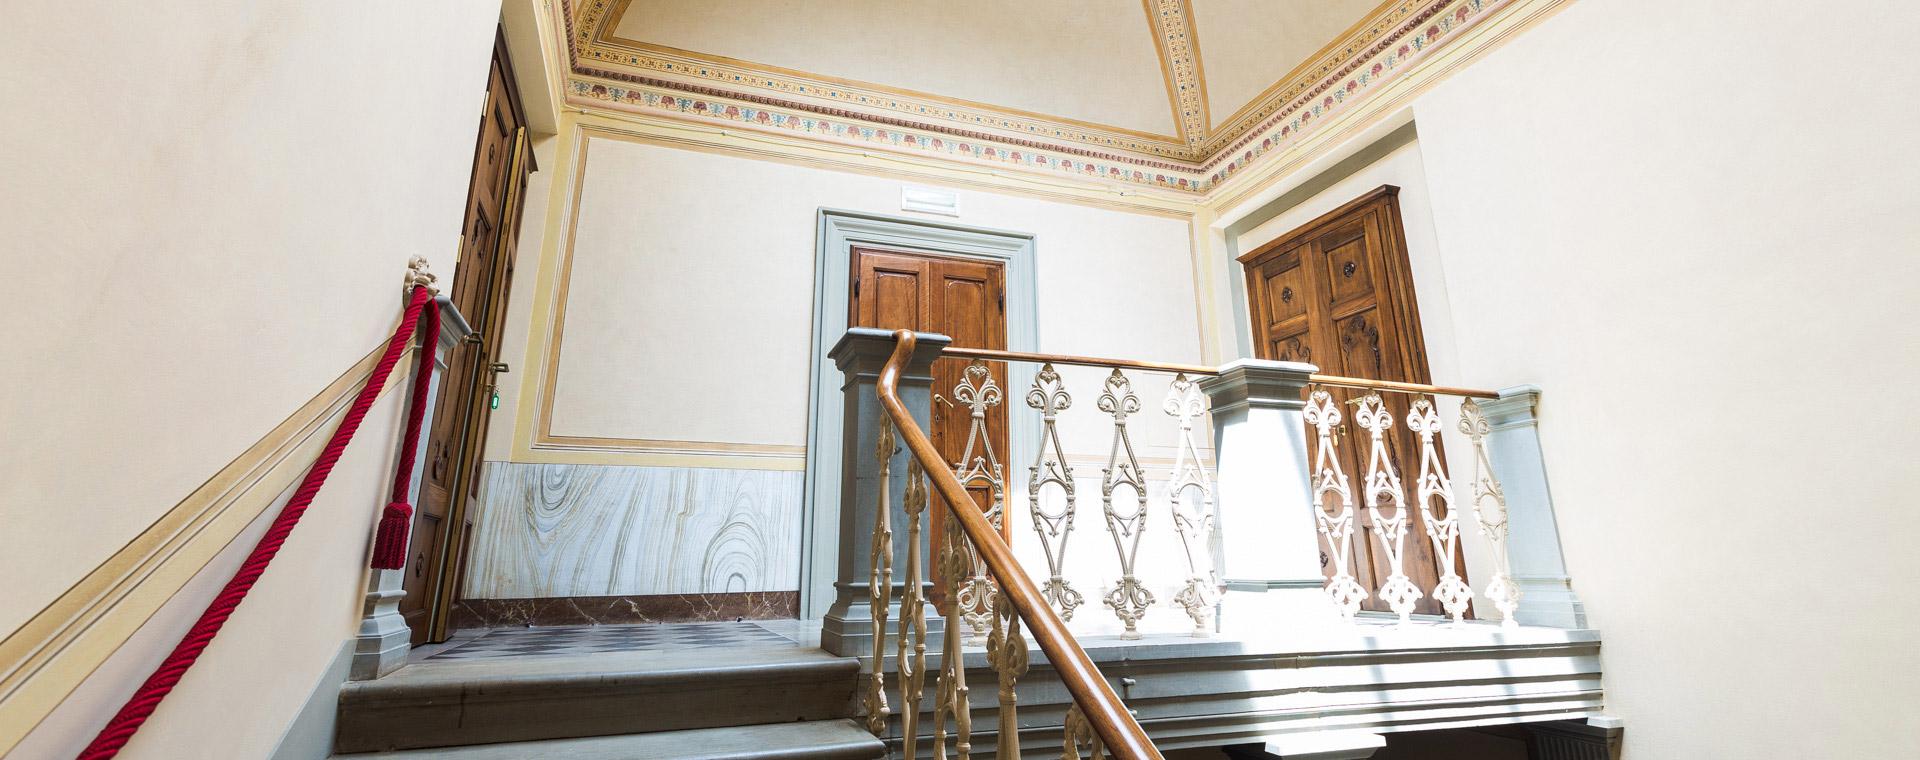 Autentica residenza d'epoca in vendita a Sansepolcor, in Toscana